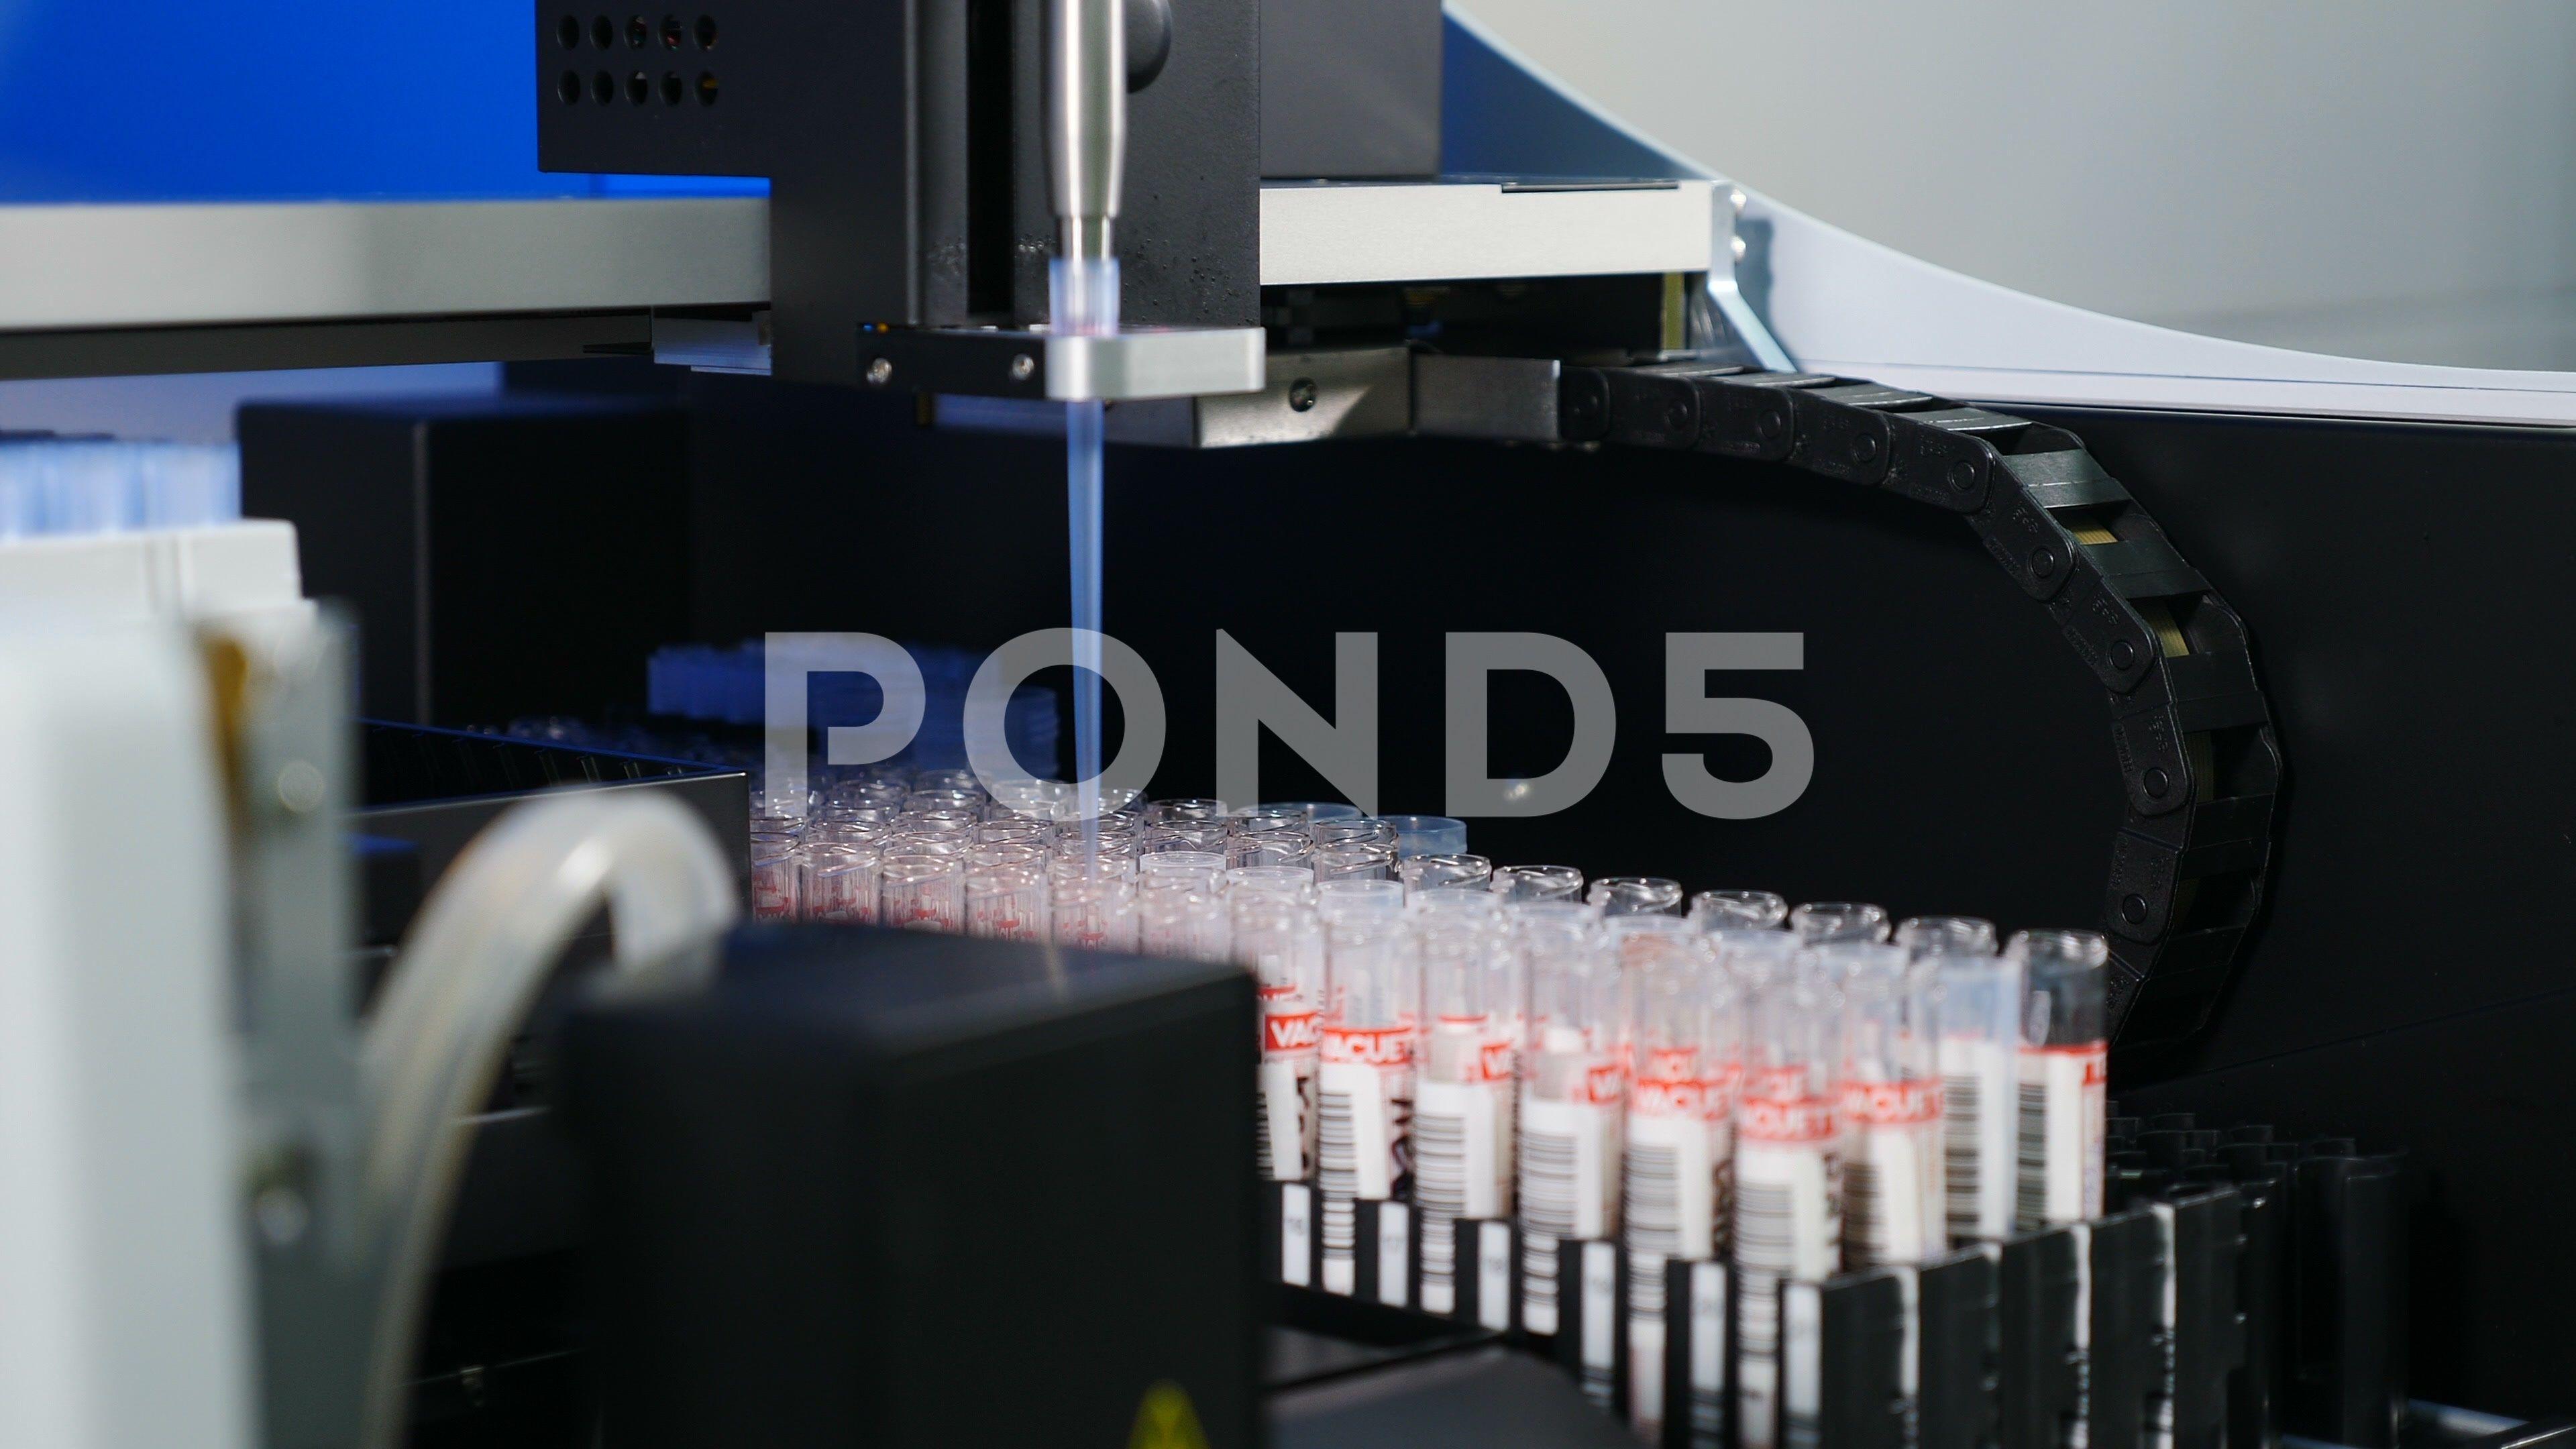 Pin on Medical Technology Logos